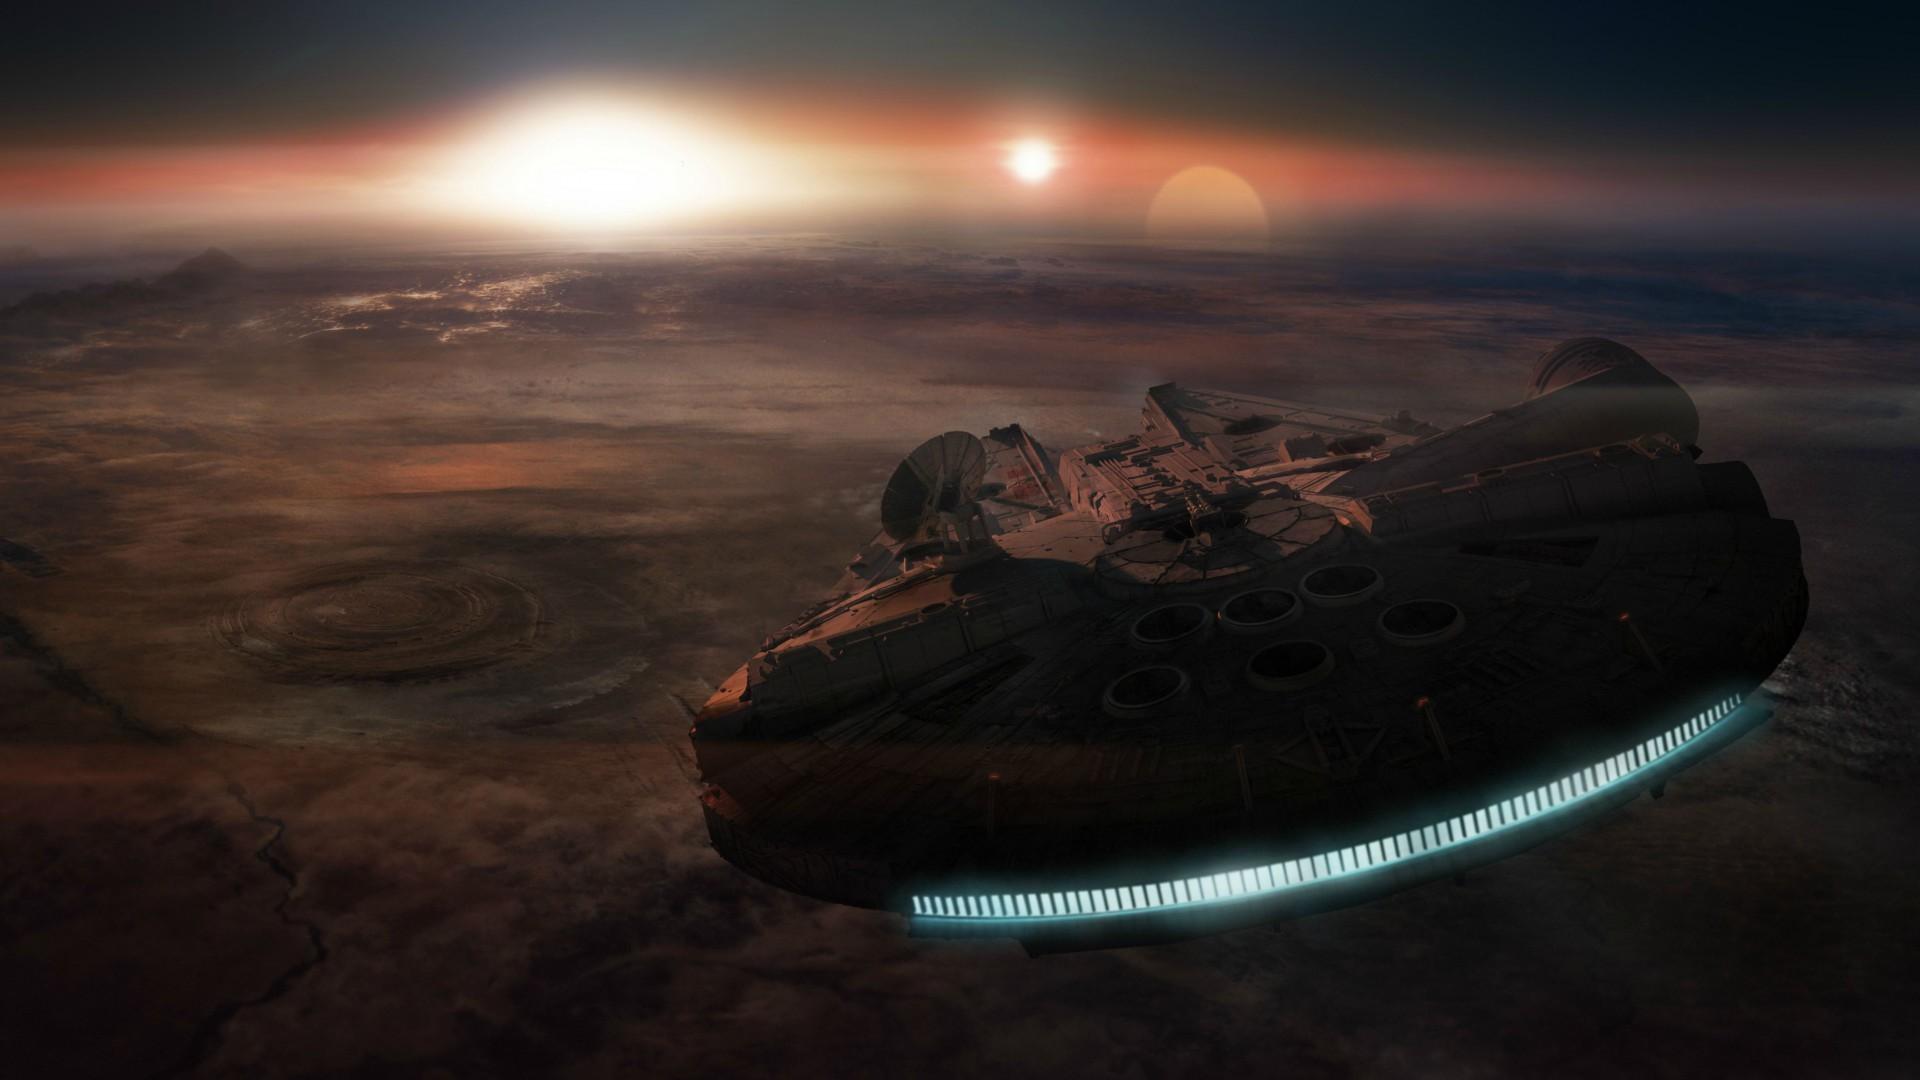 Star Wars: The Force Awakens Desktop Wallpapers